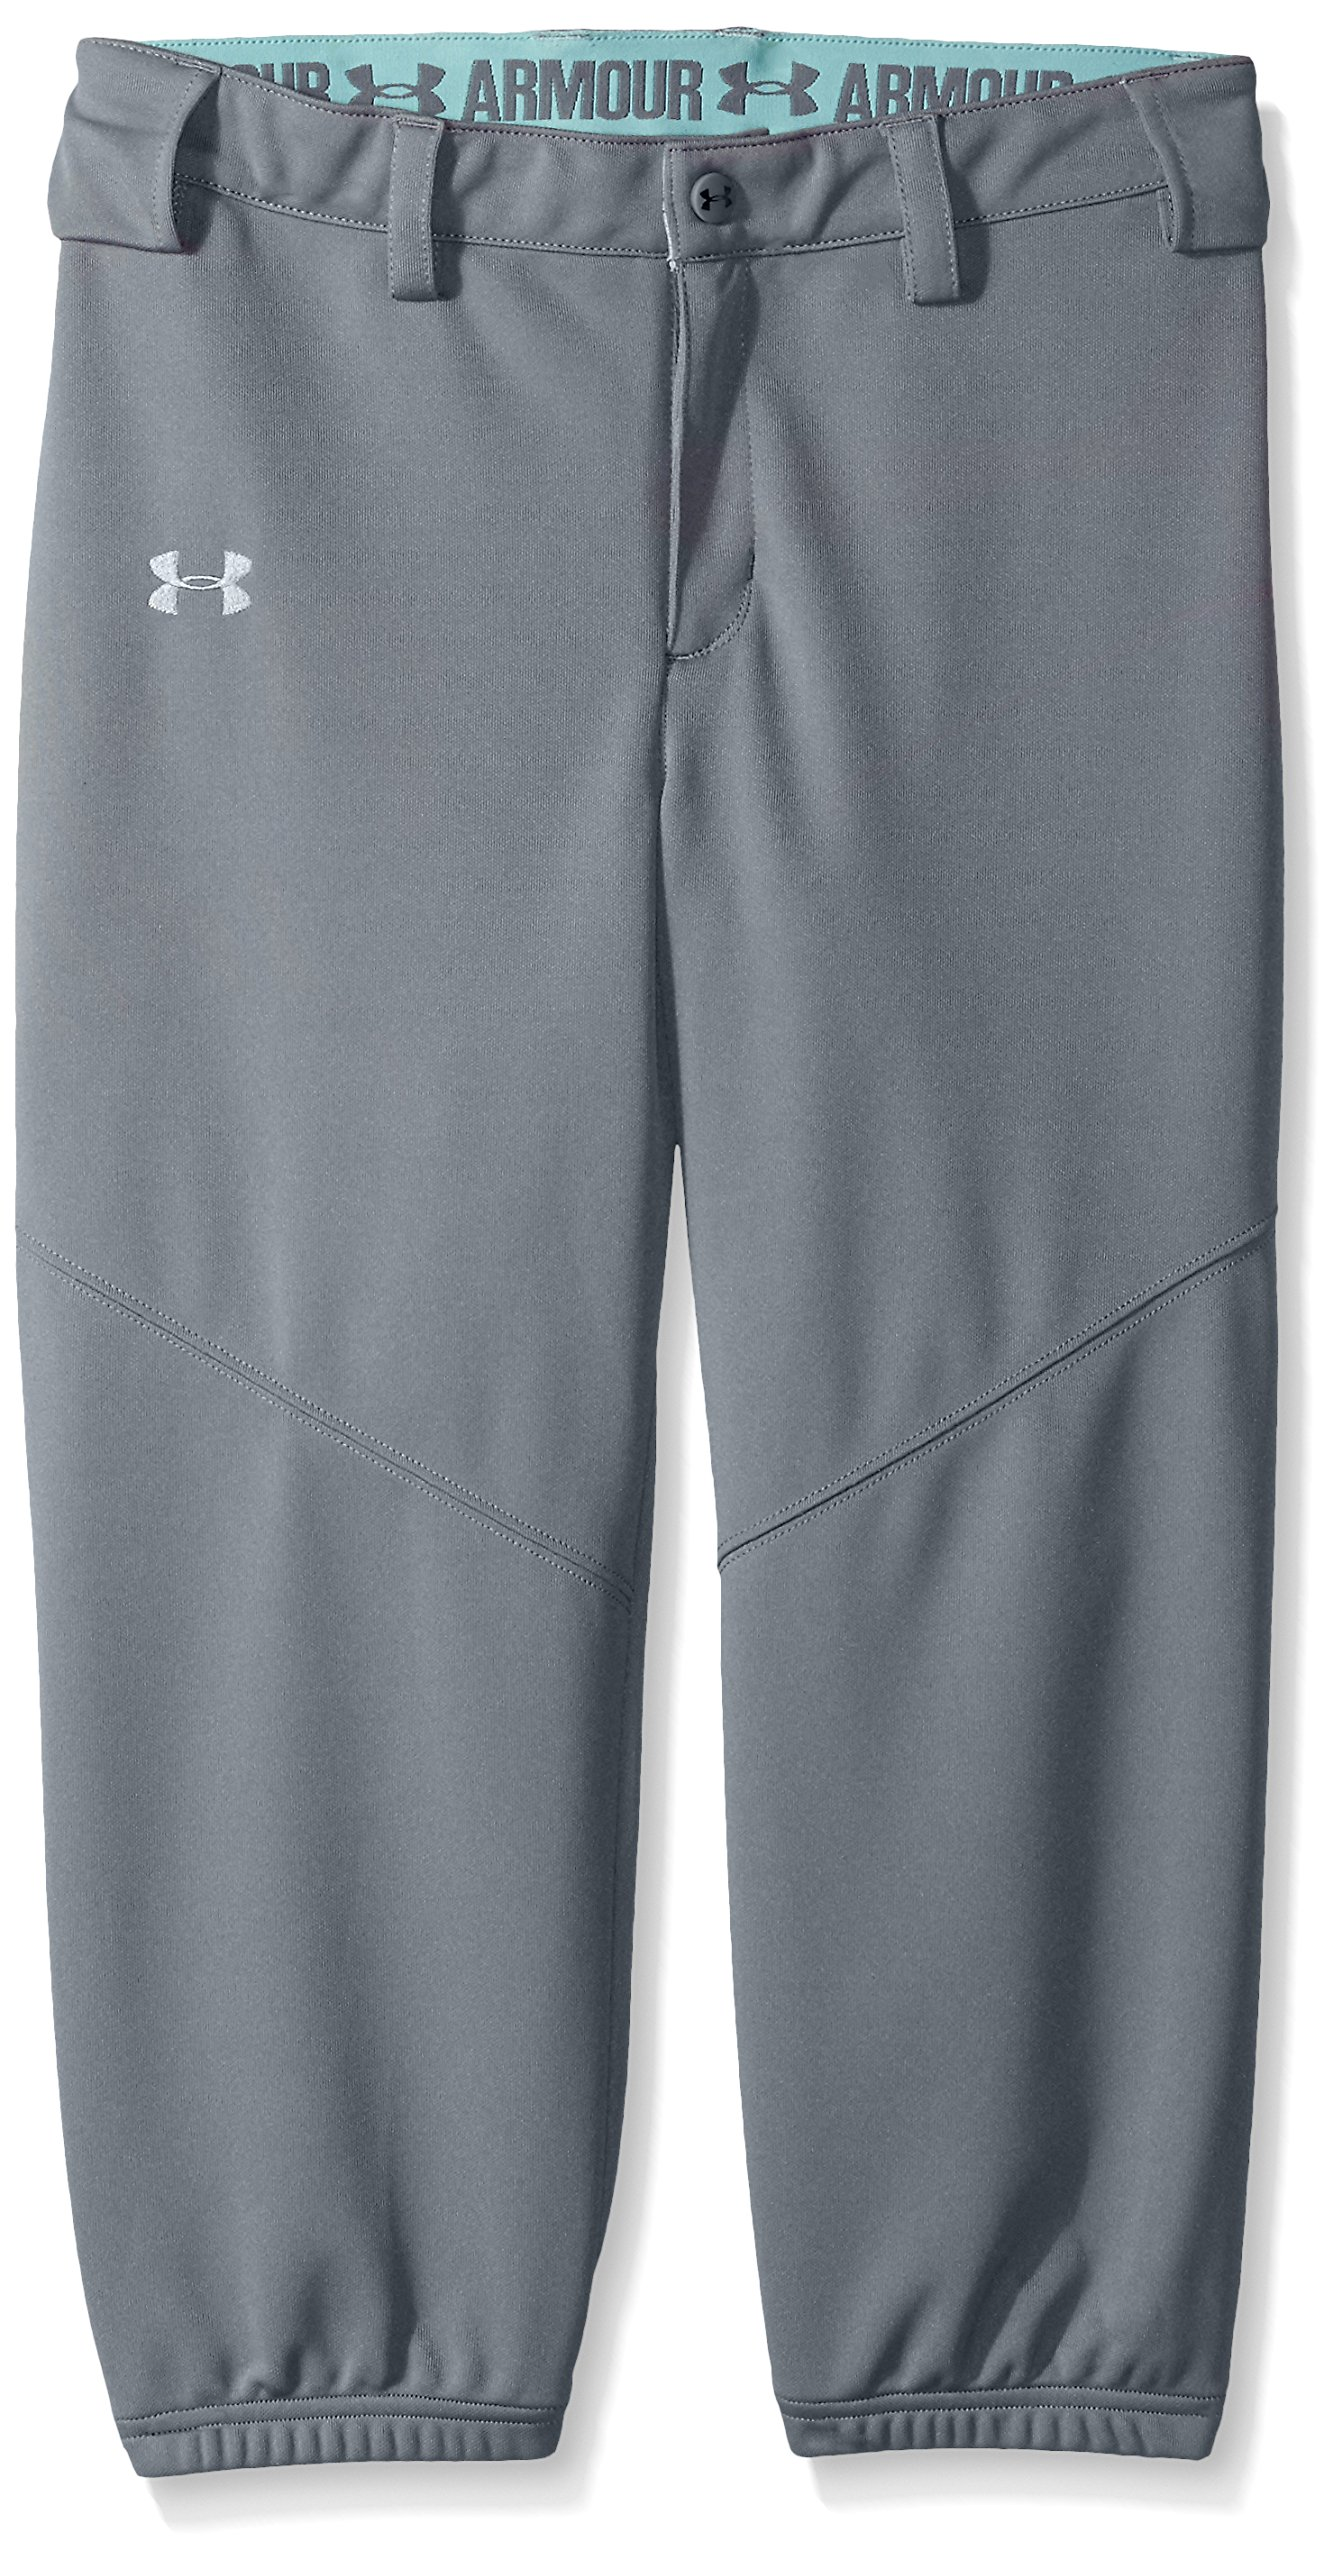 Under Armour Girls' Base Runner Softball Pants, Steel (035)/Overcast Gray, Youth Large